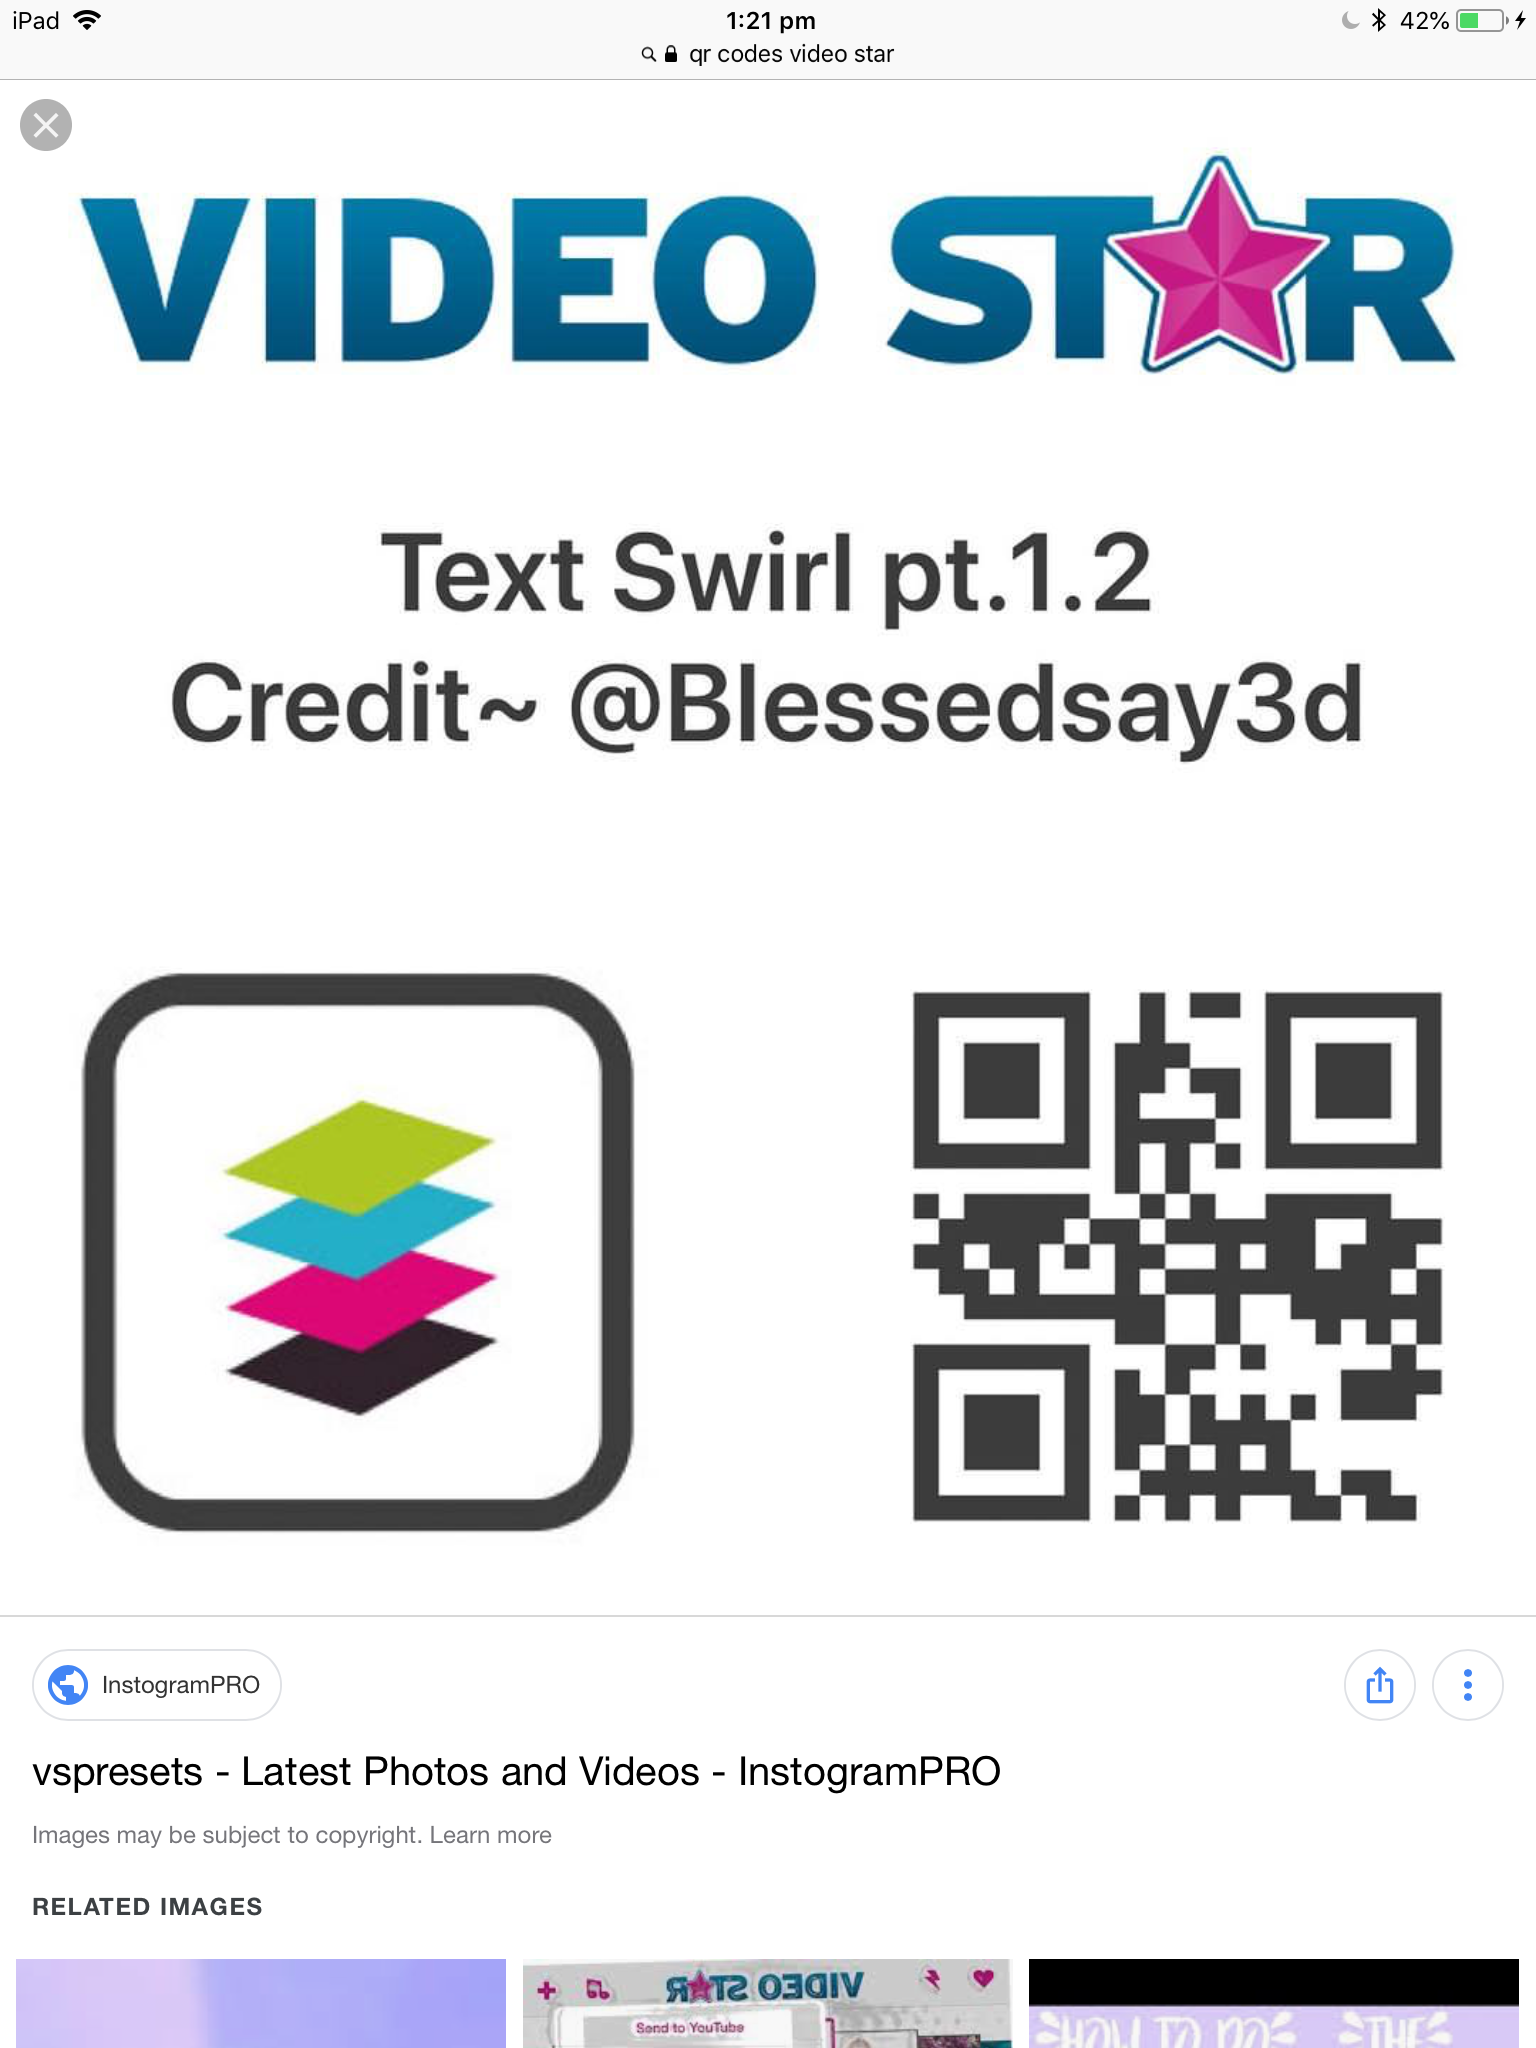 Video star text swirl QR Code | Text codes, Coding, Qr code